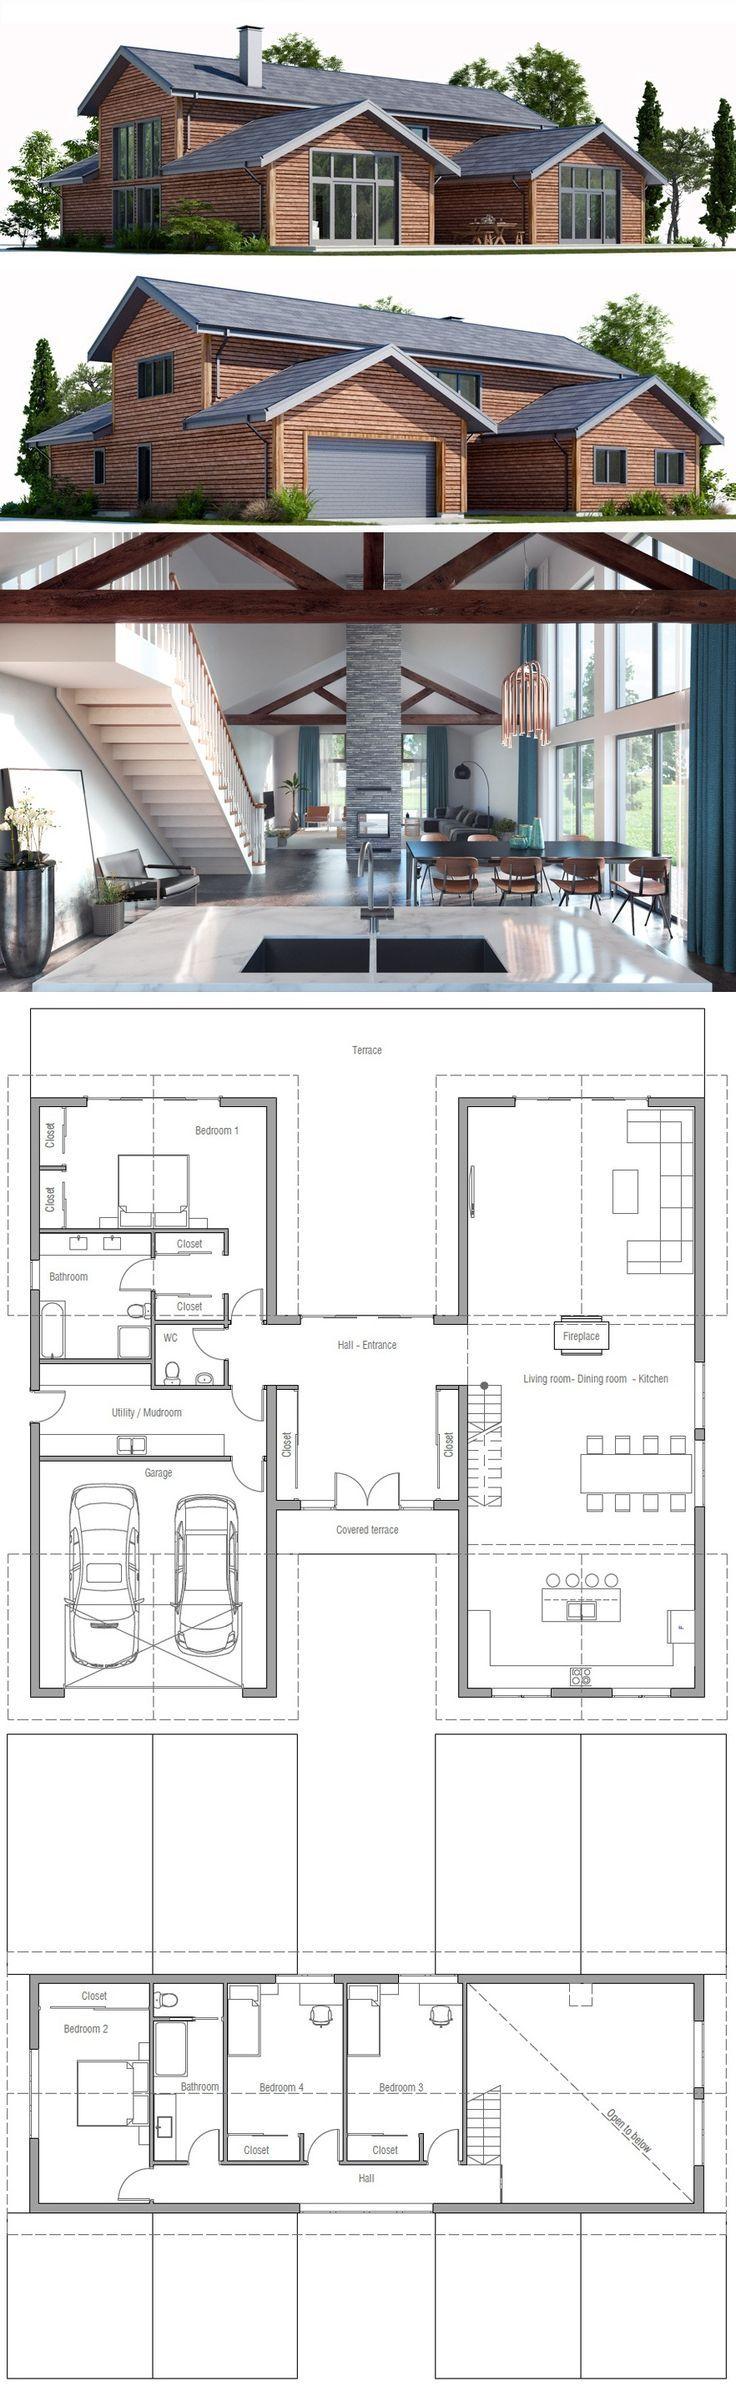 best home floor plans ideas pinterest house blueprints and simple ...